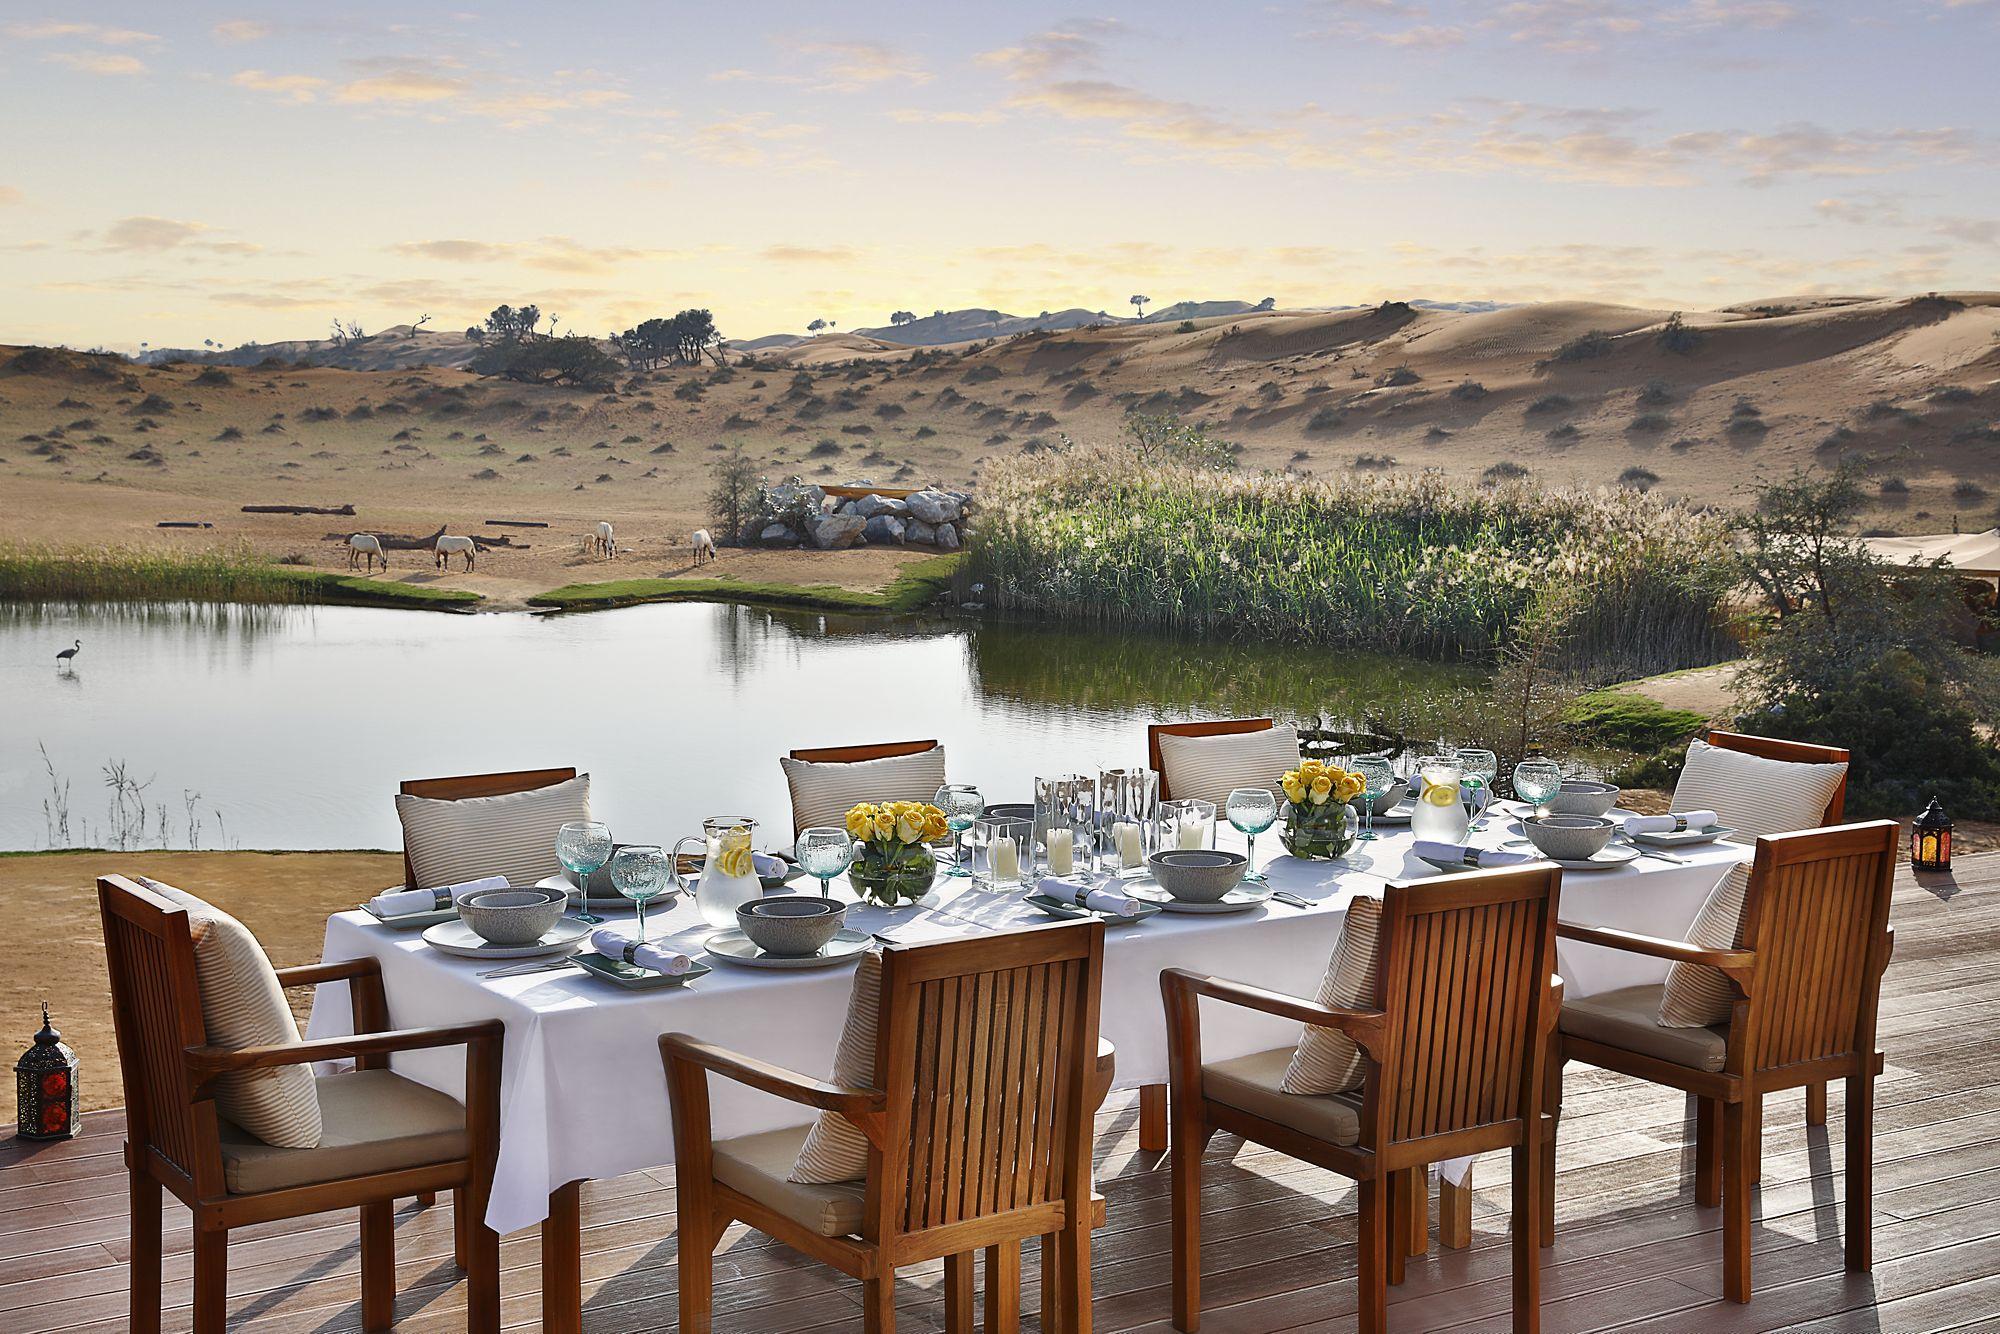 al-wadi-desert-picnic-lunch